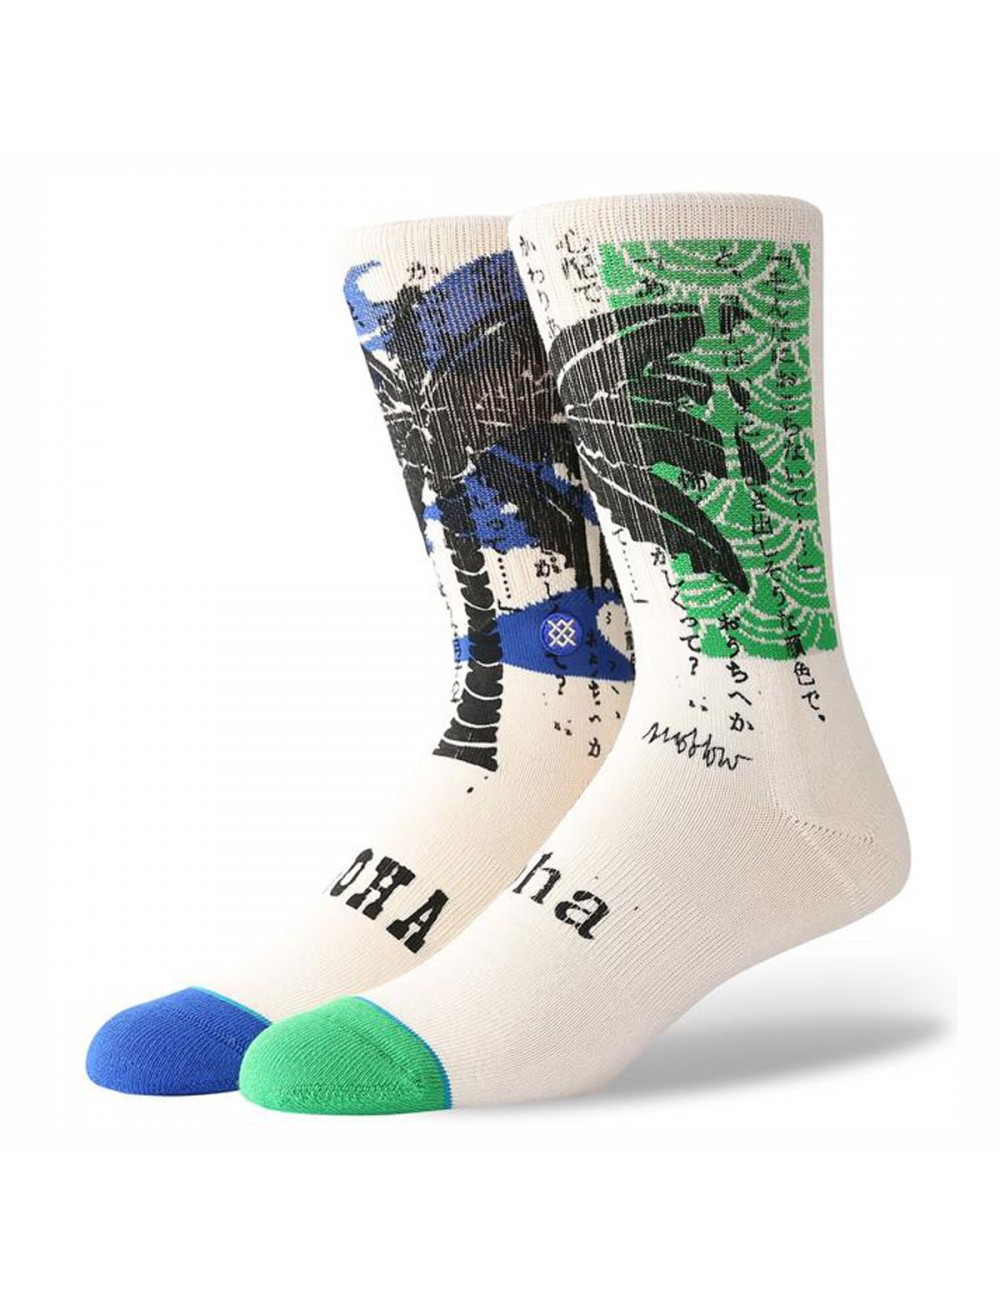 Stance Oblow Palm Socken - Natural_11420